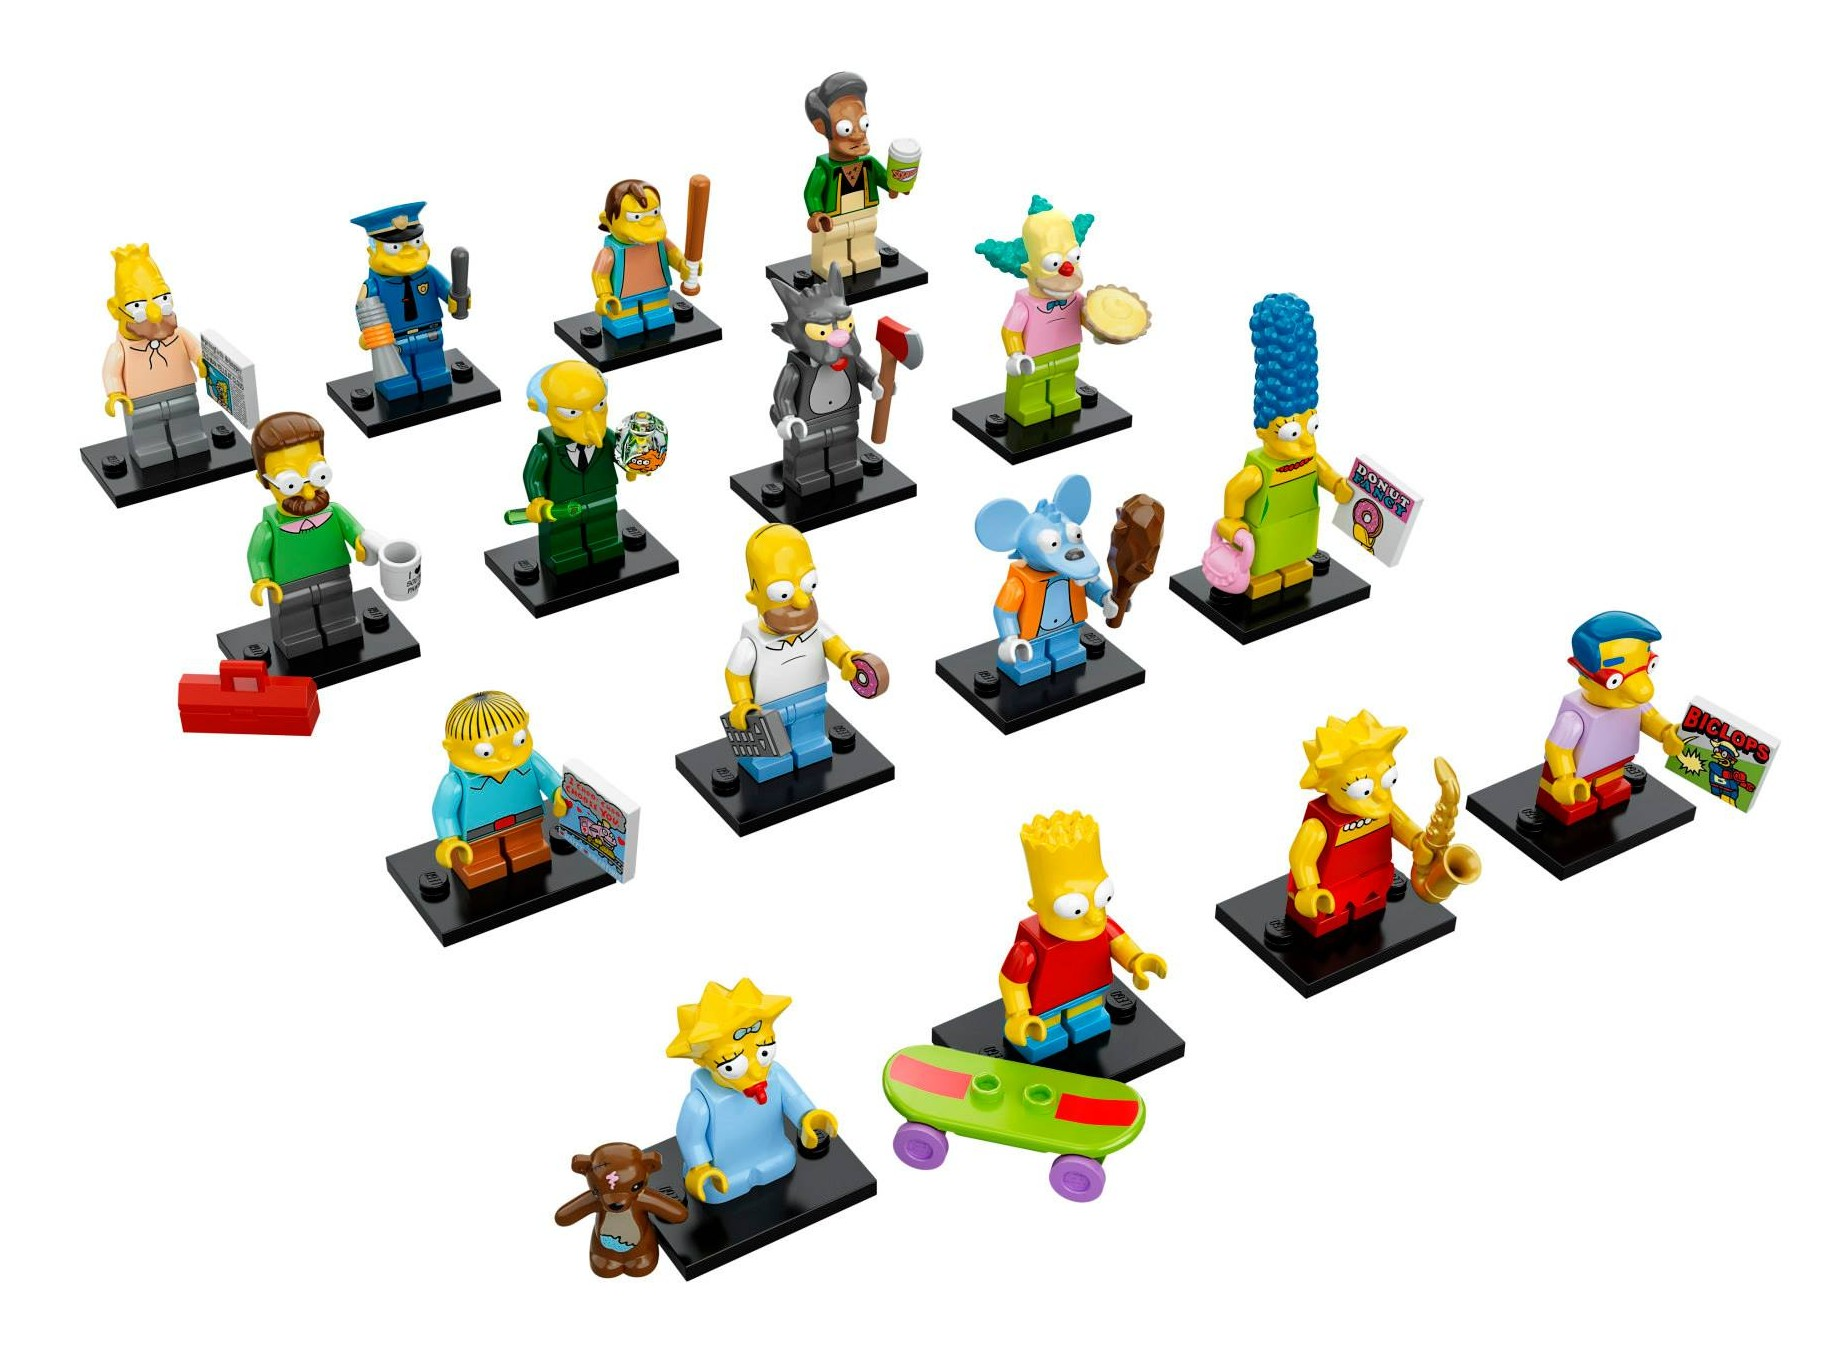 Lego Simpsons Minifigures Series Photos Fully Revealed